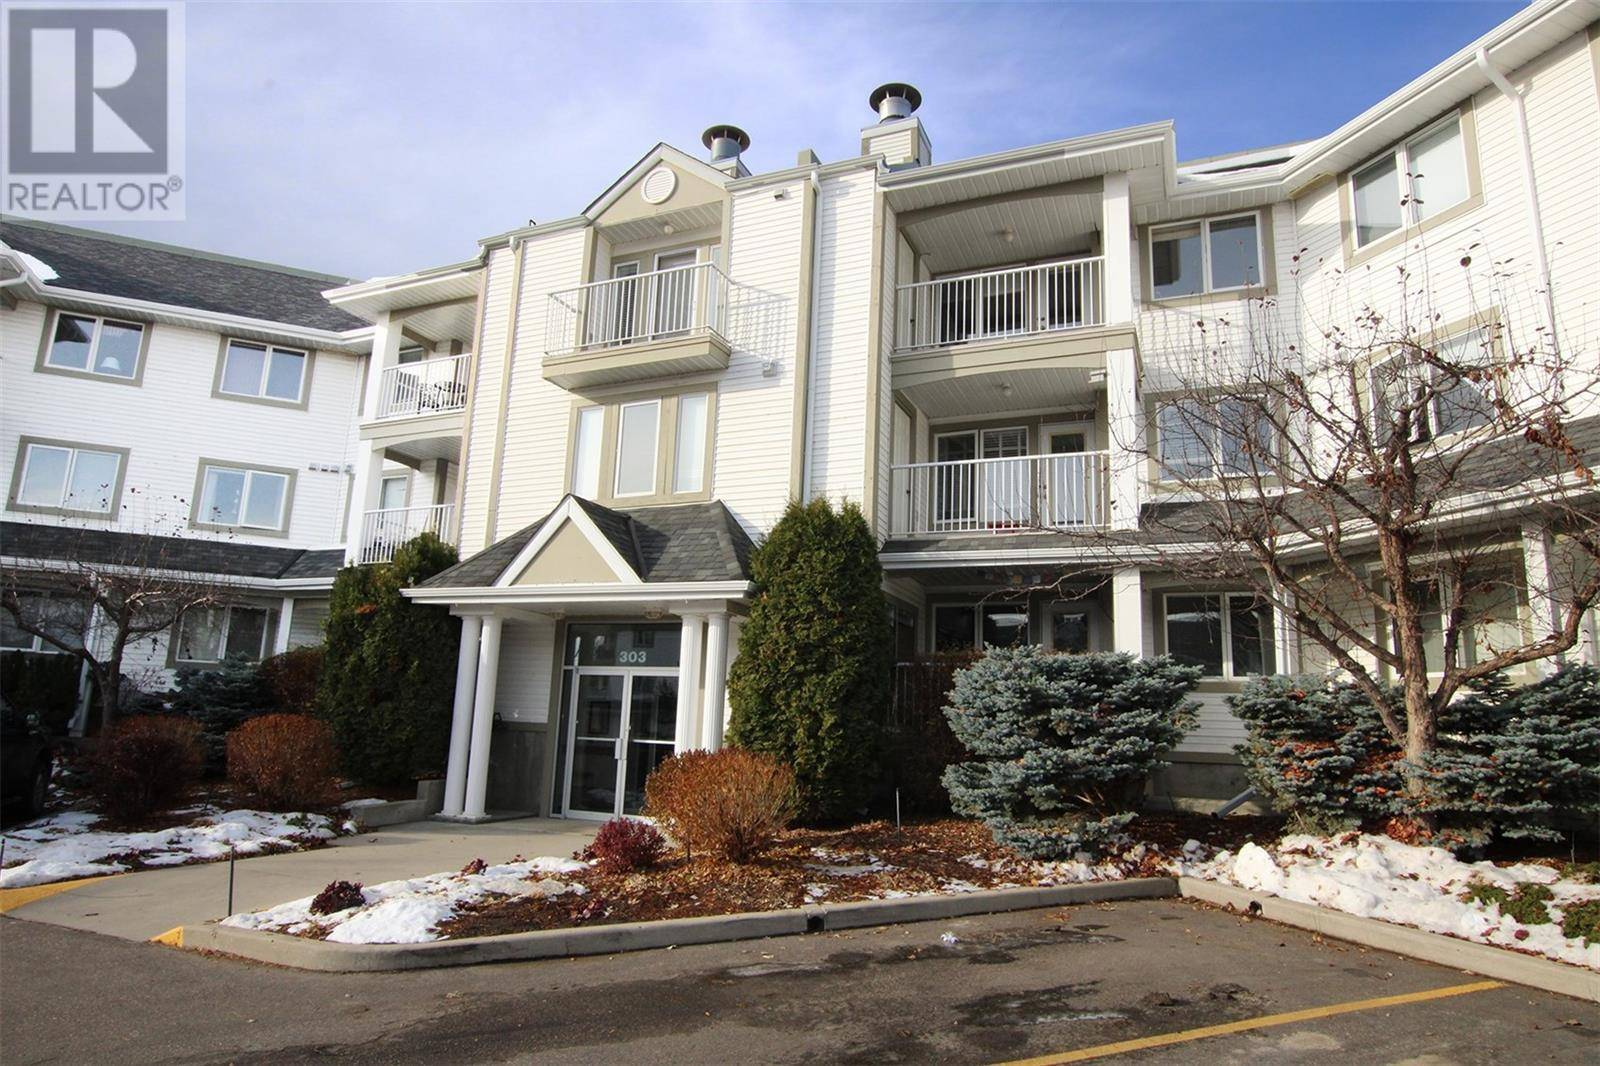 Condo for sale at 303 Pinehouse Dr Saskatoon Saskatchewan - MLS: SK790664